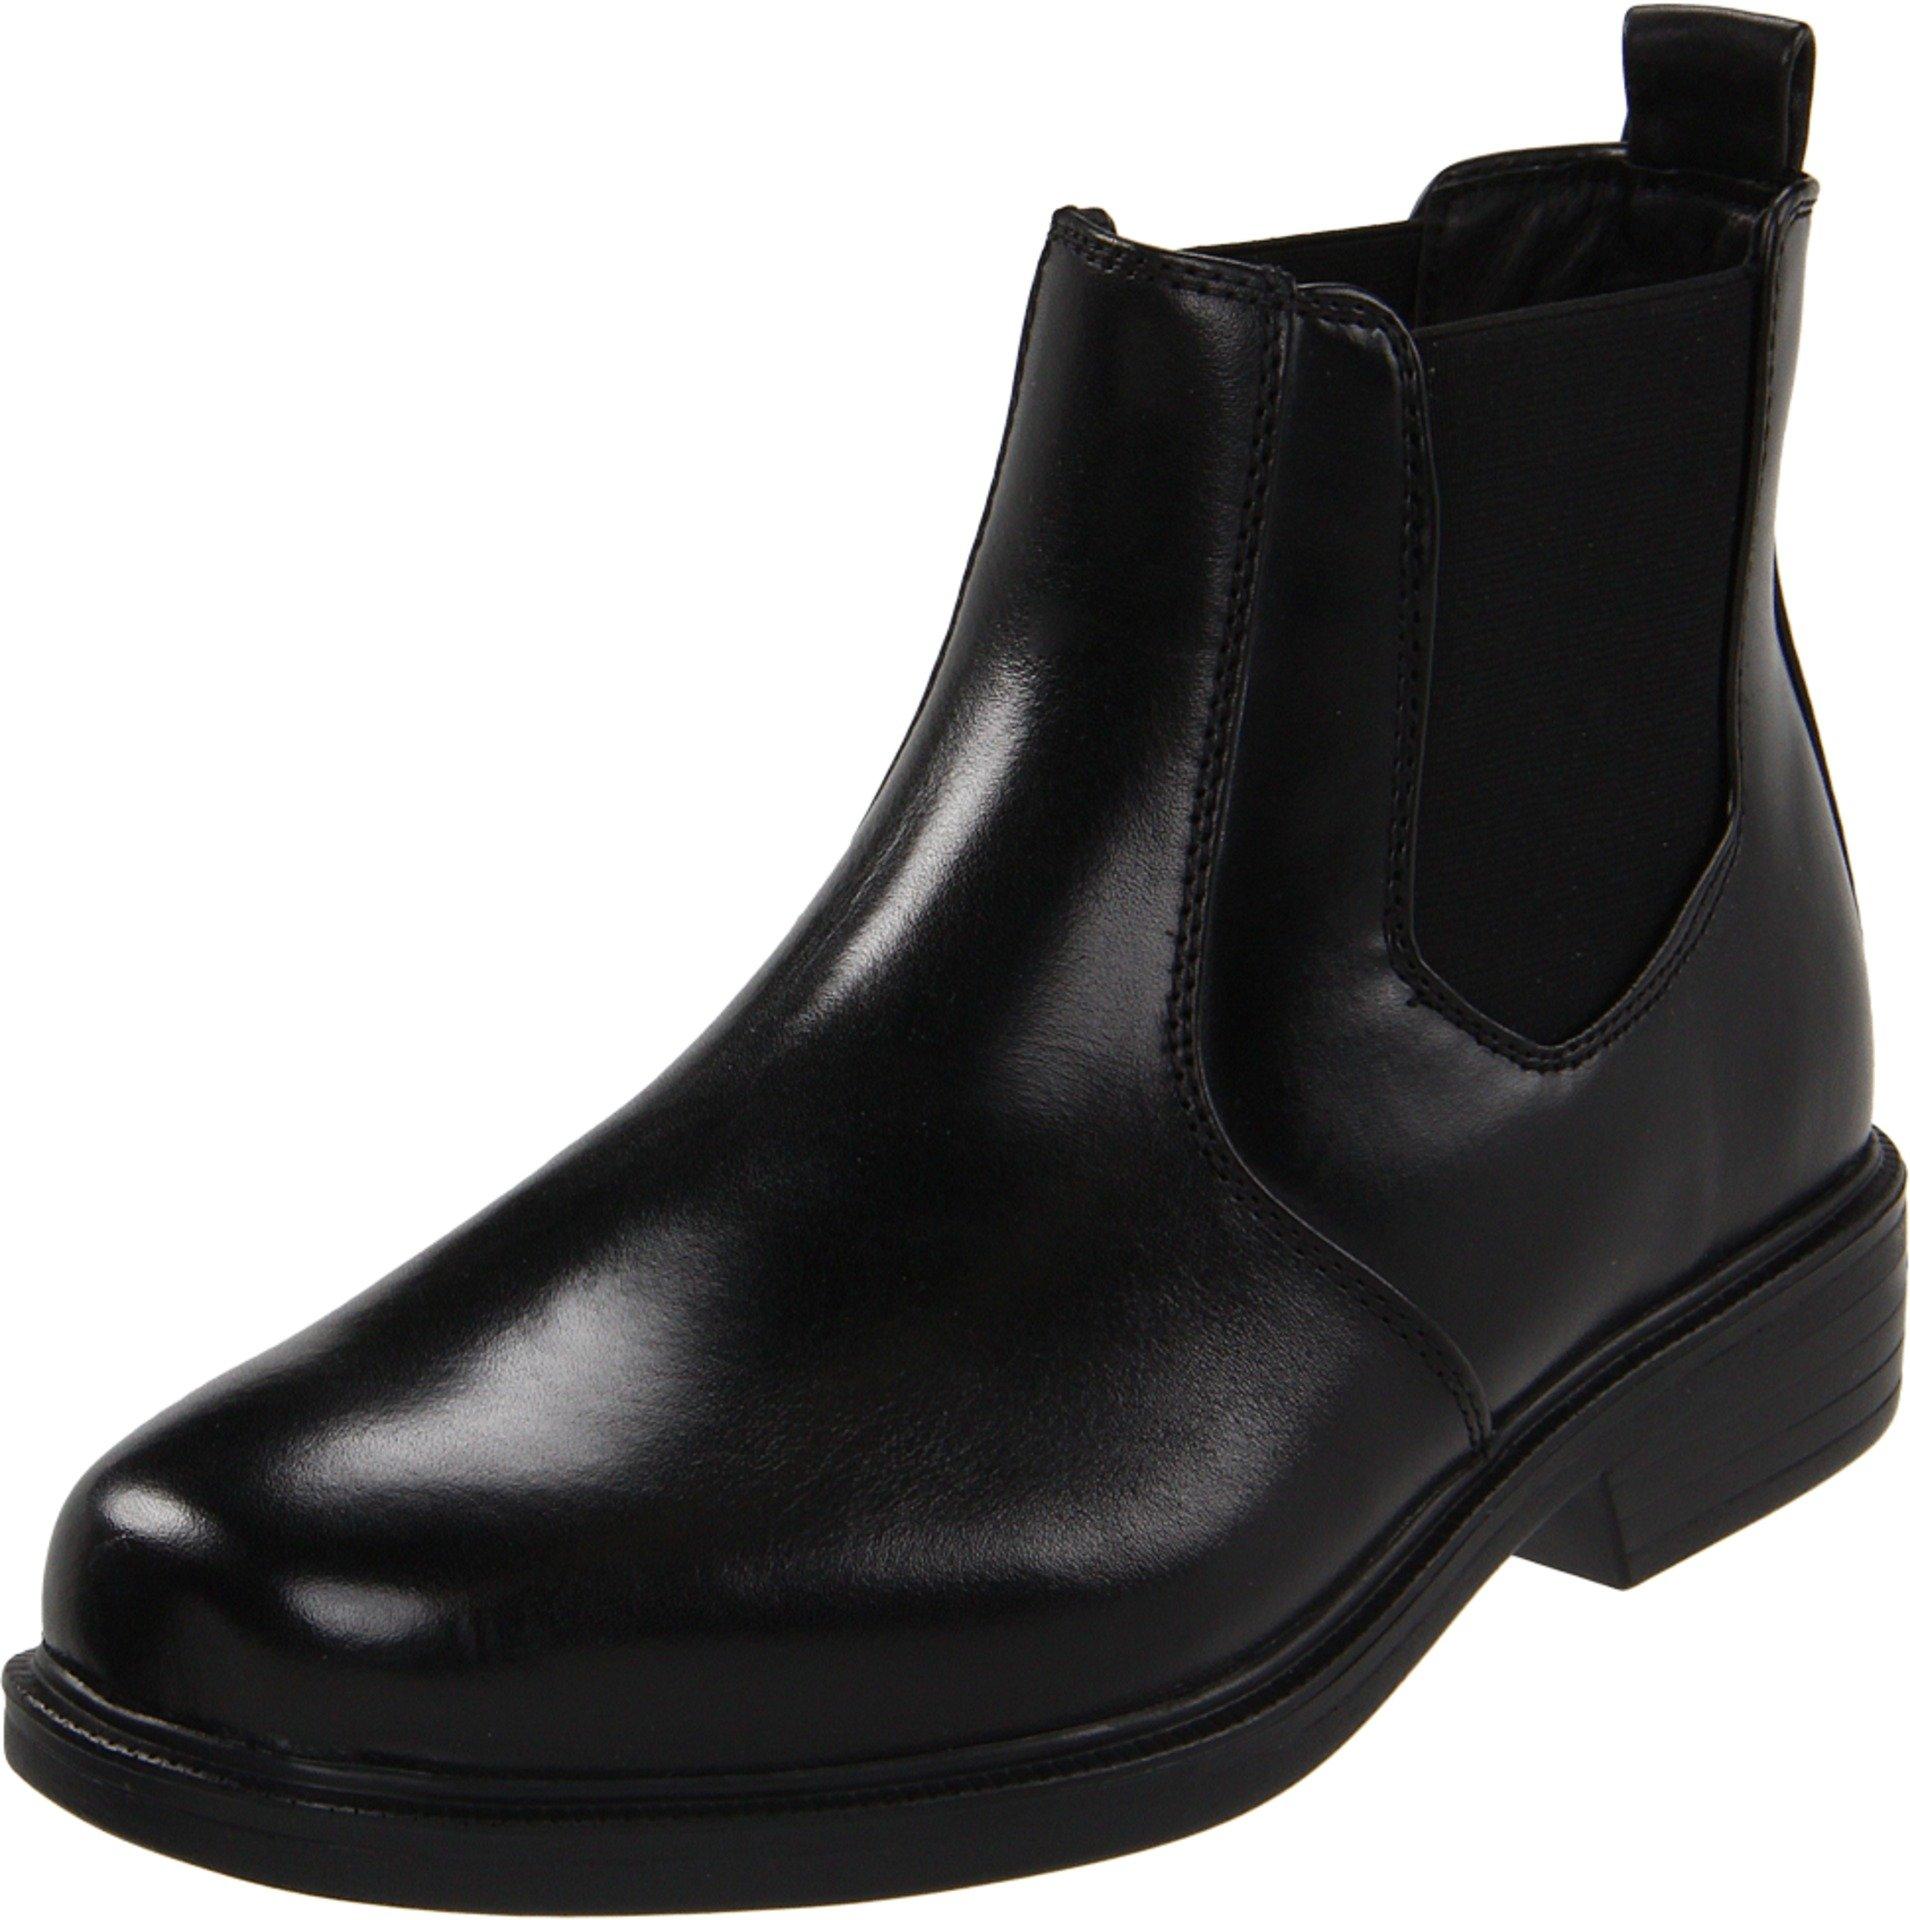 Giorgio Brutini Men's Plain Toe Ankle Boots,Black,7 W